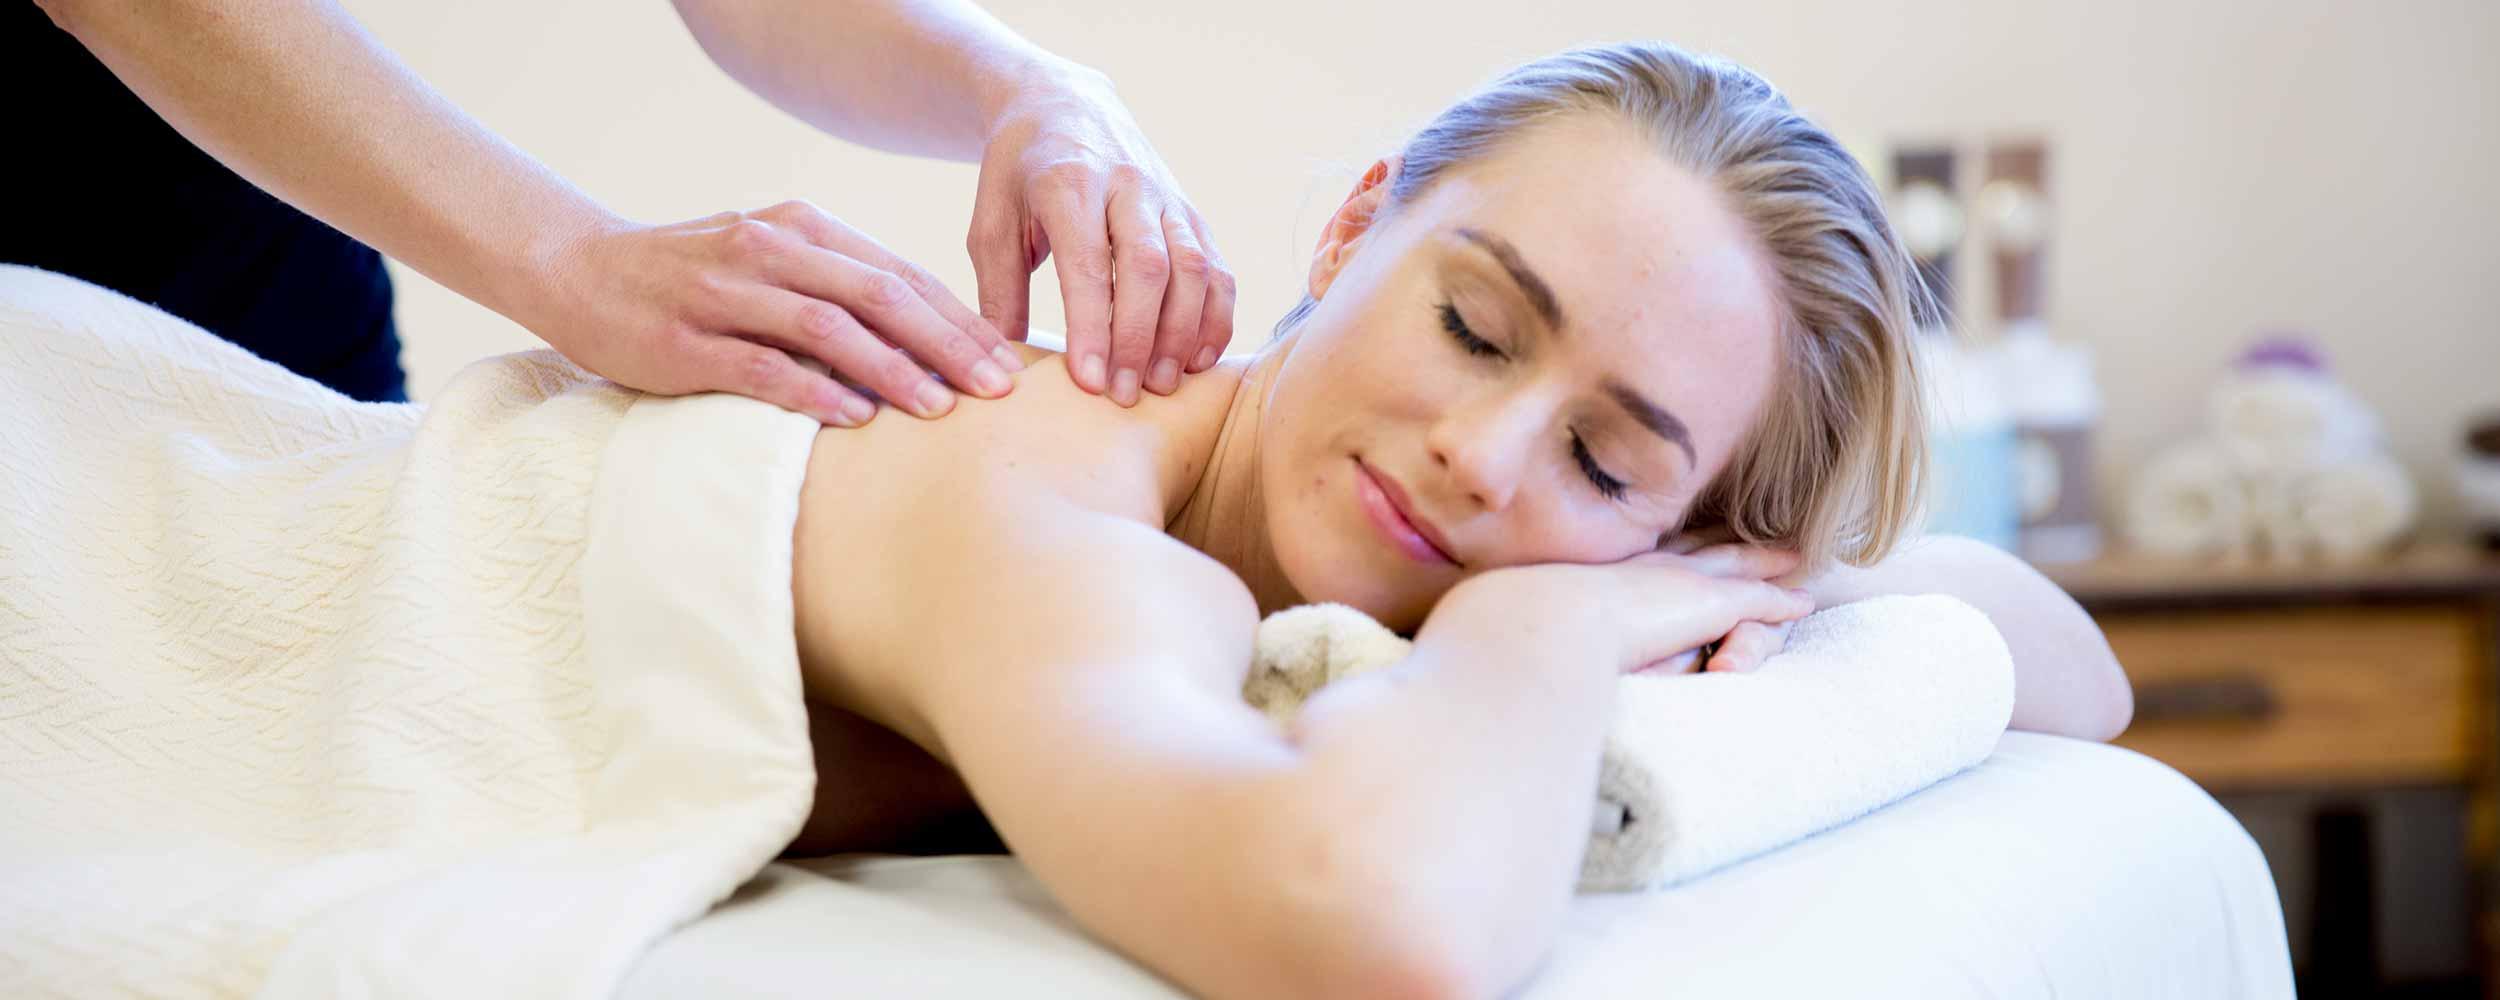 Alisal Spa treatments - Alisal Resort in Solvang California